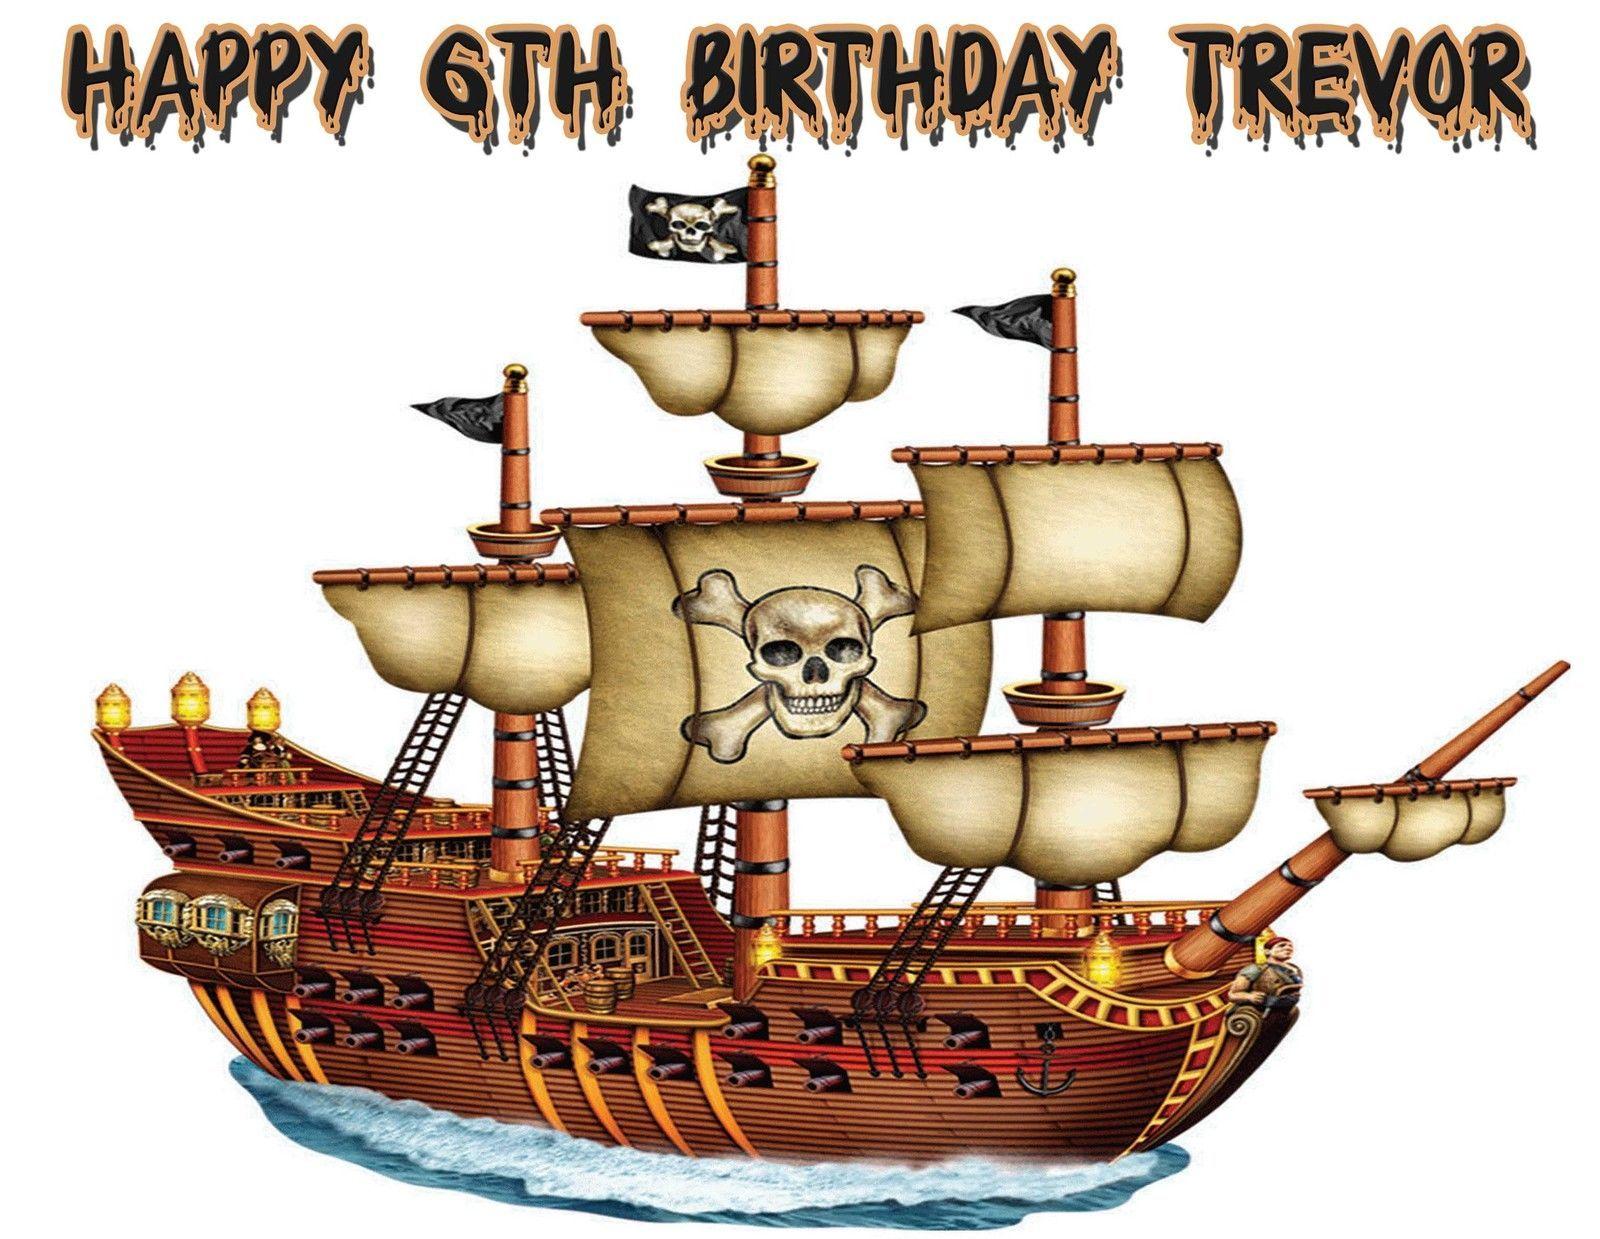 Custom Pirate Ship Treasure Map Theme Edible Image Cake